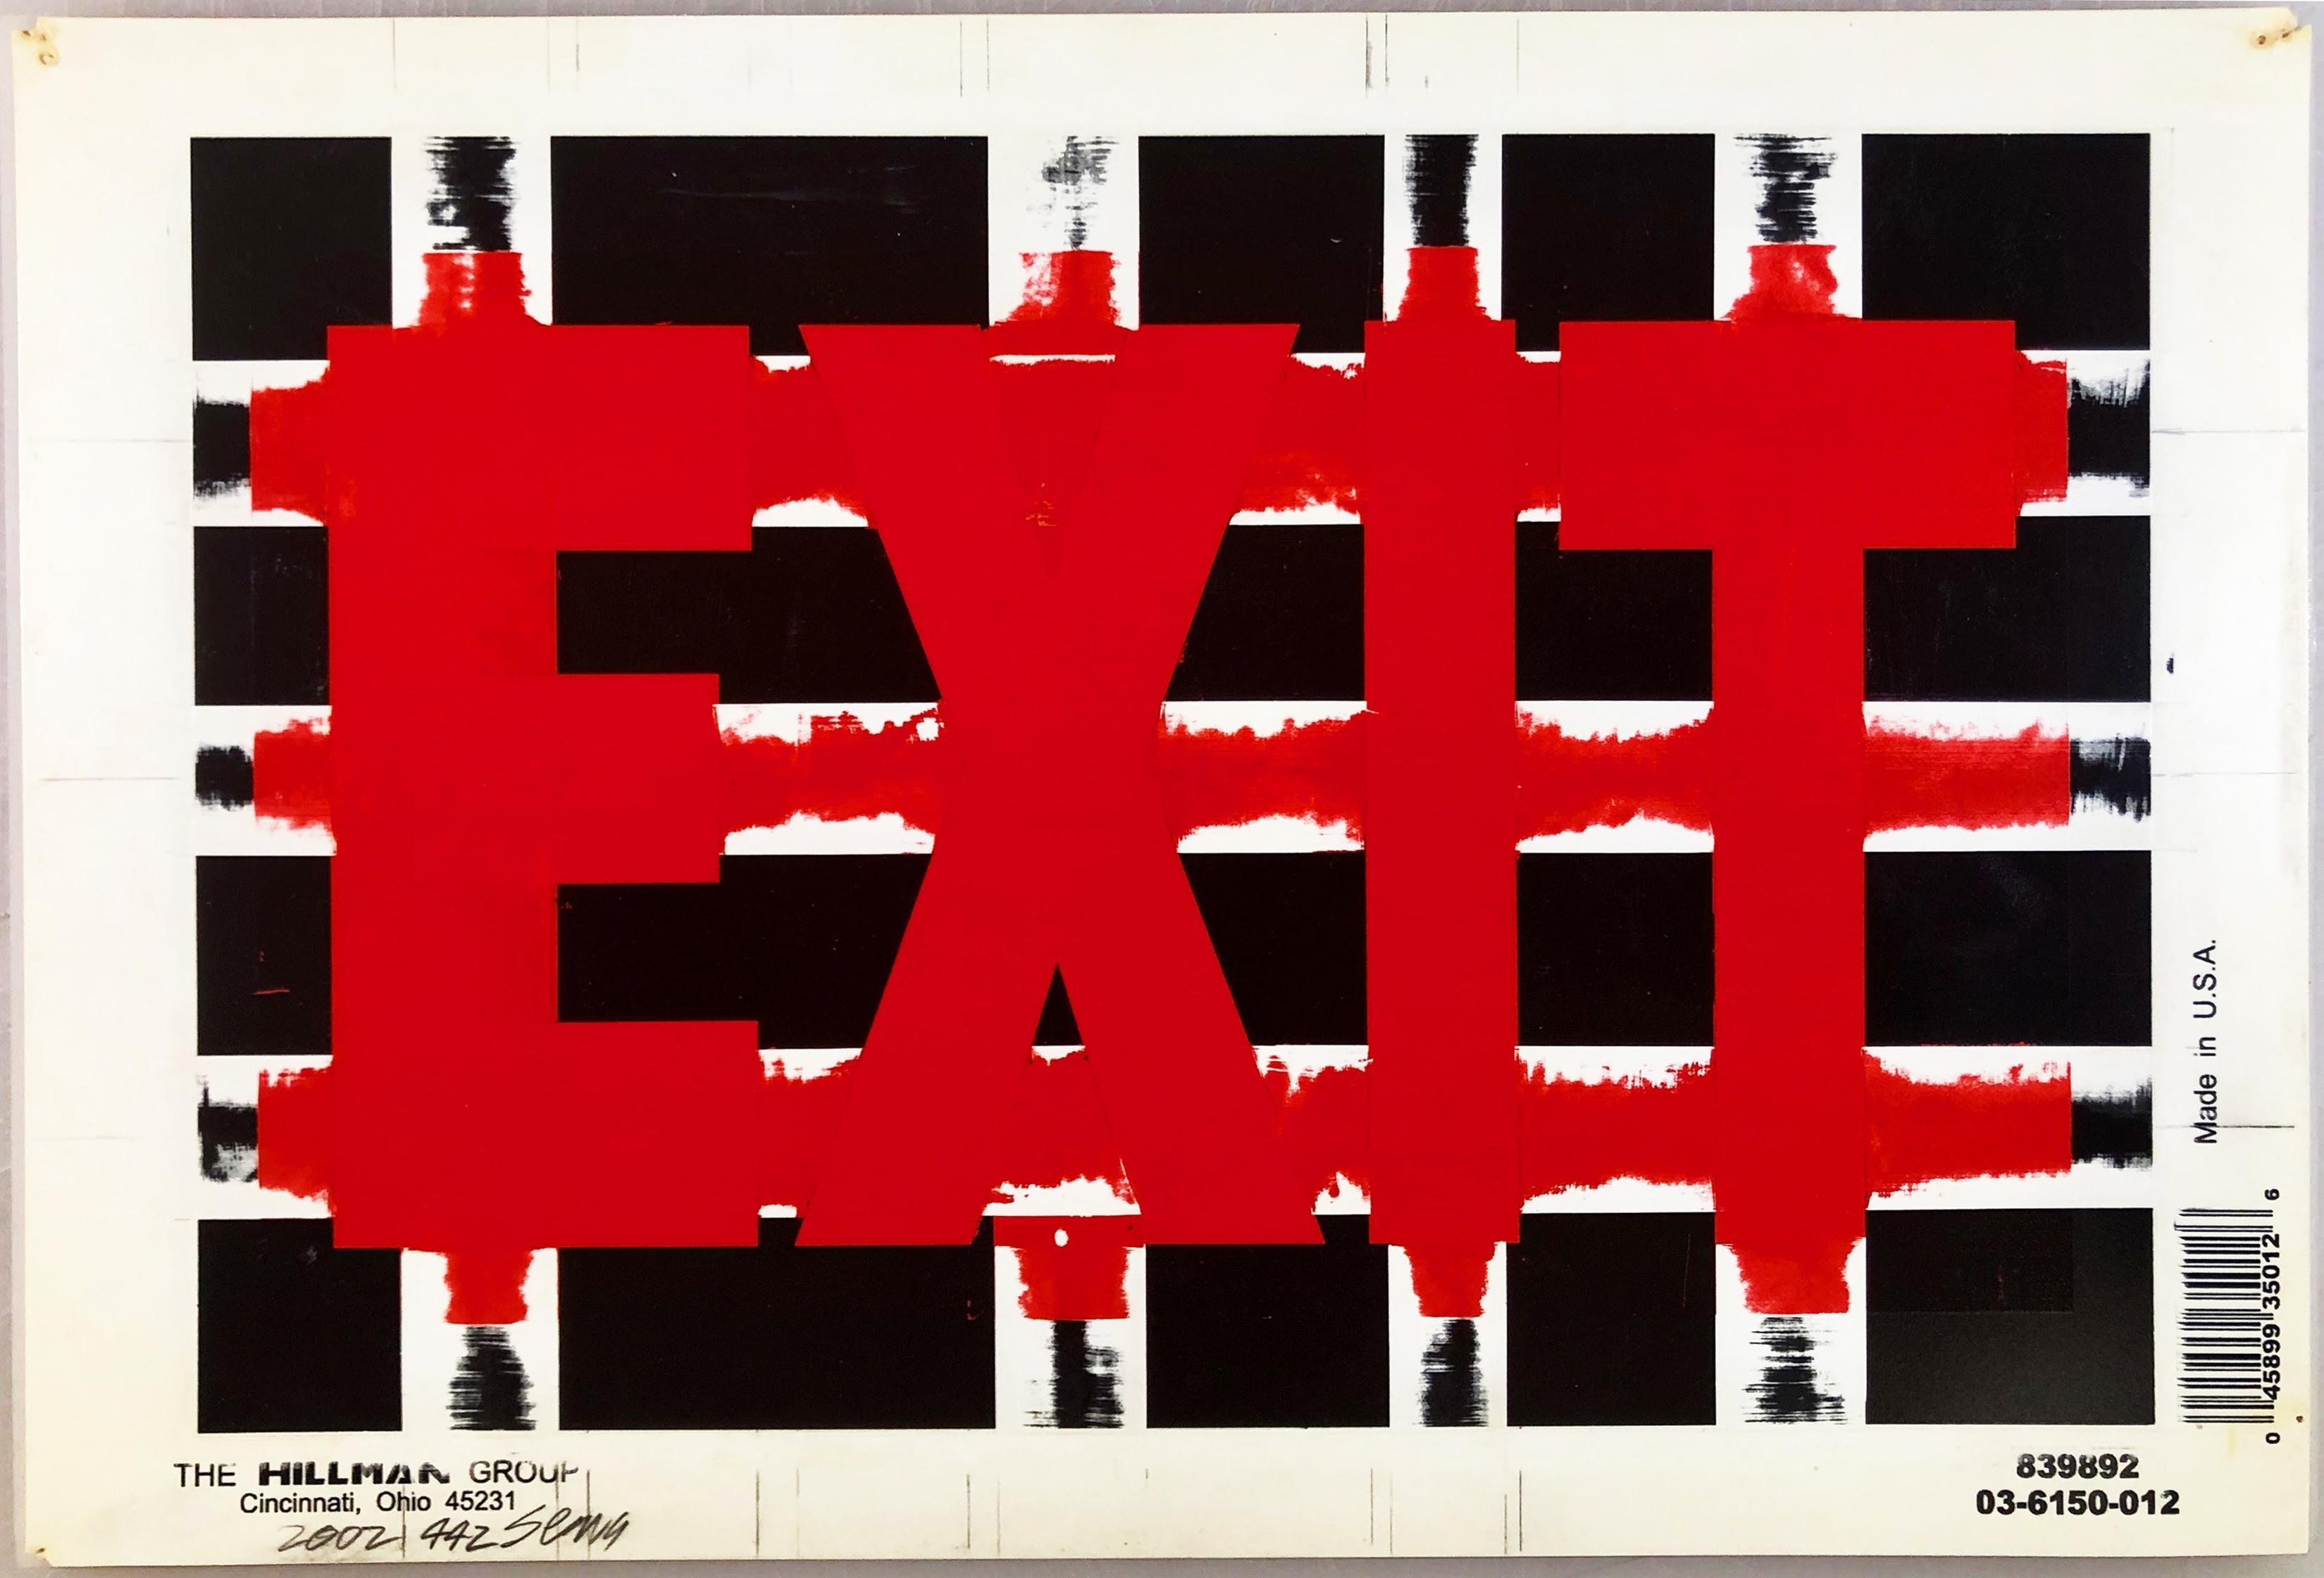 "Bob Seng, Exit 442, 2002, scraped, collaged, EXIT signs, 8"" x 12"""